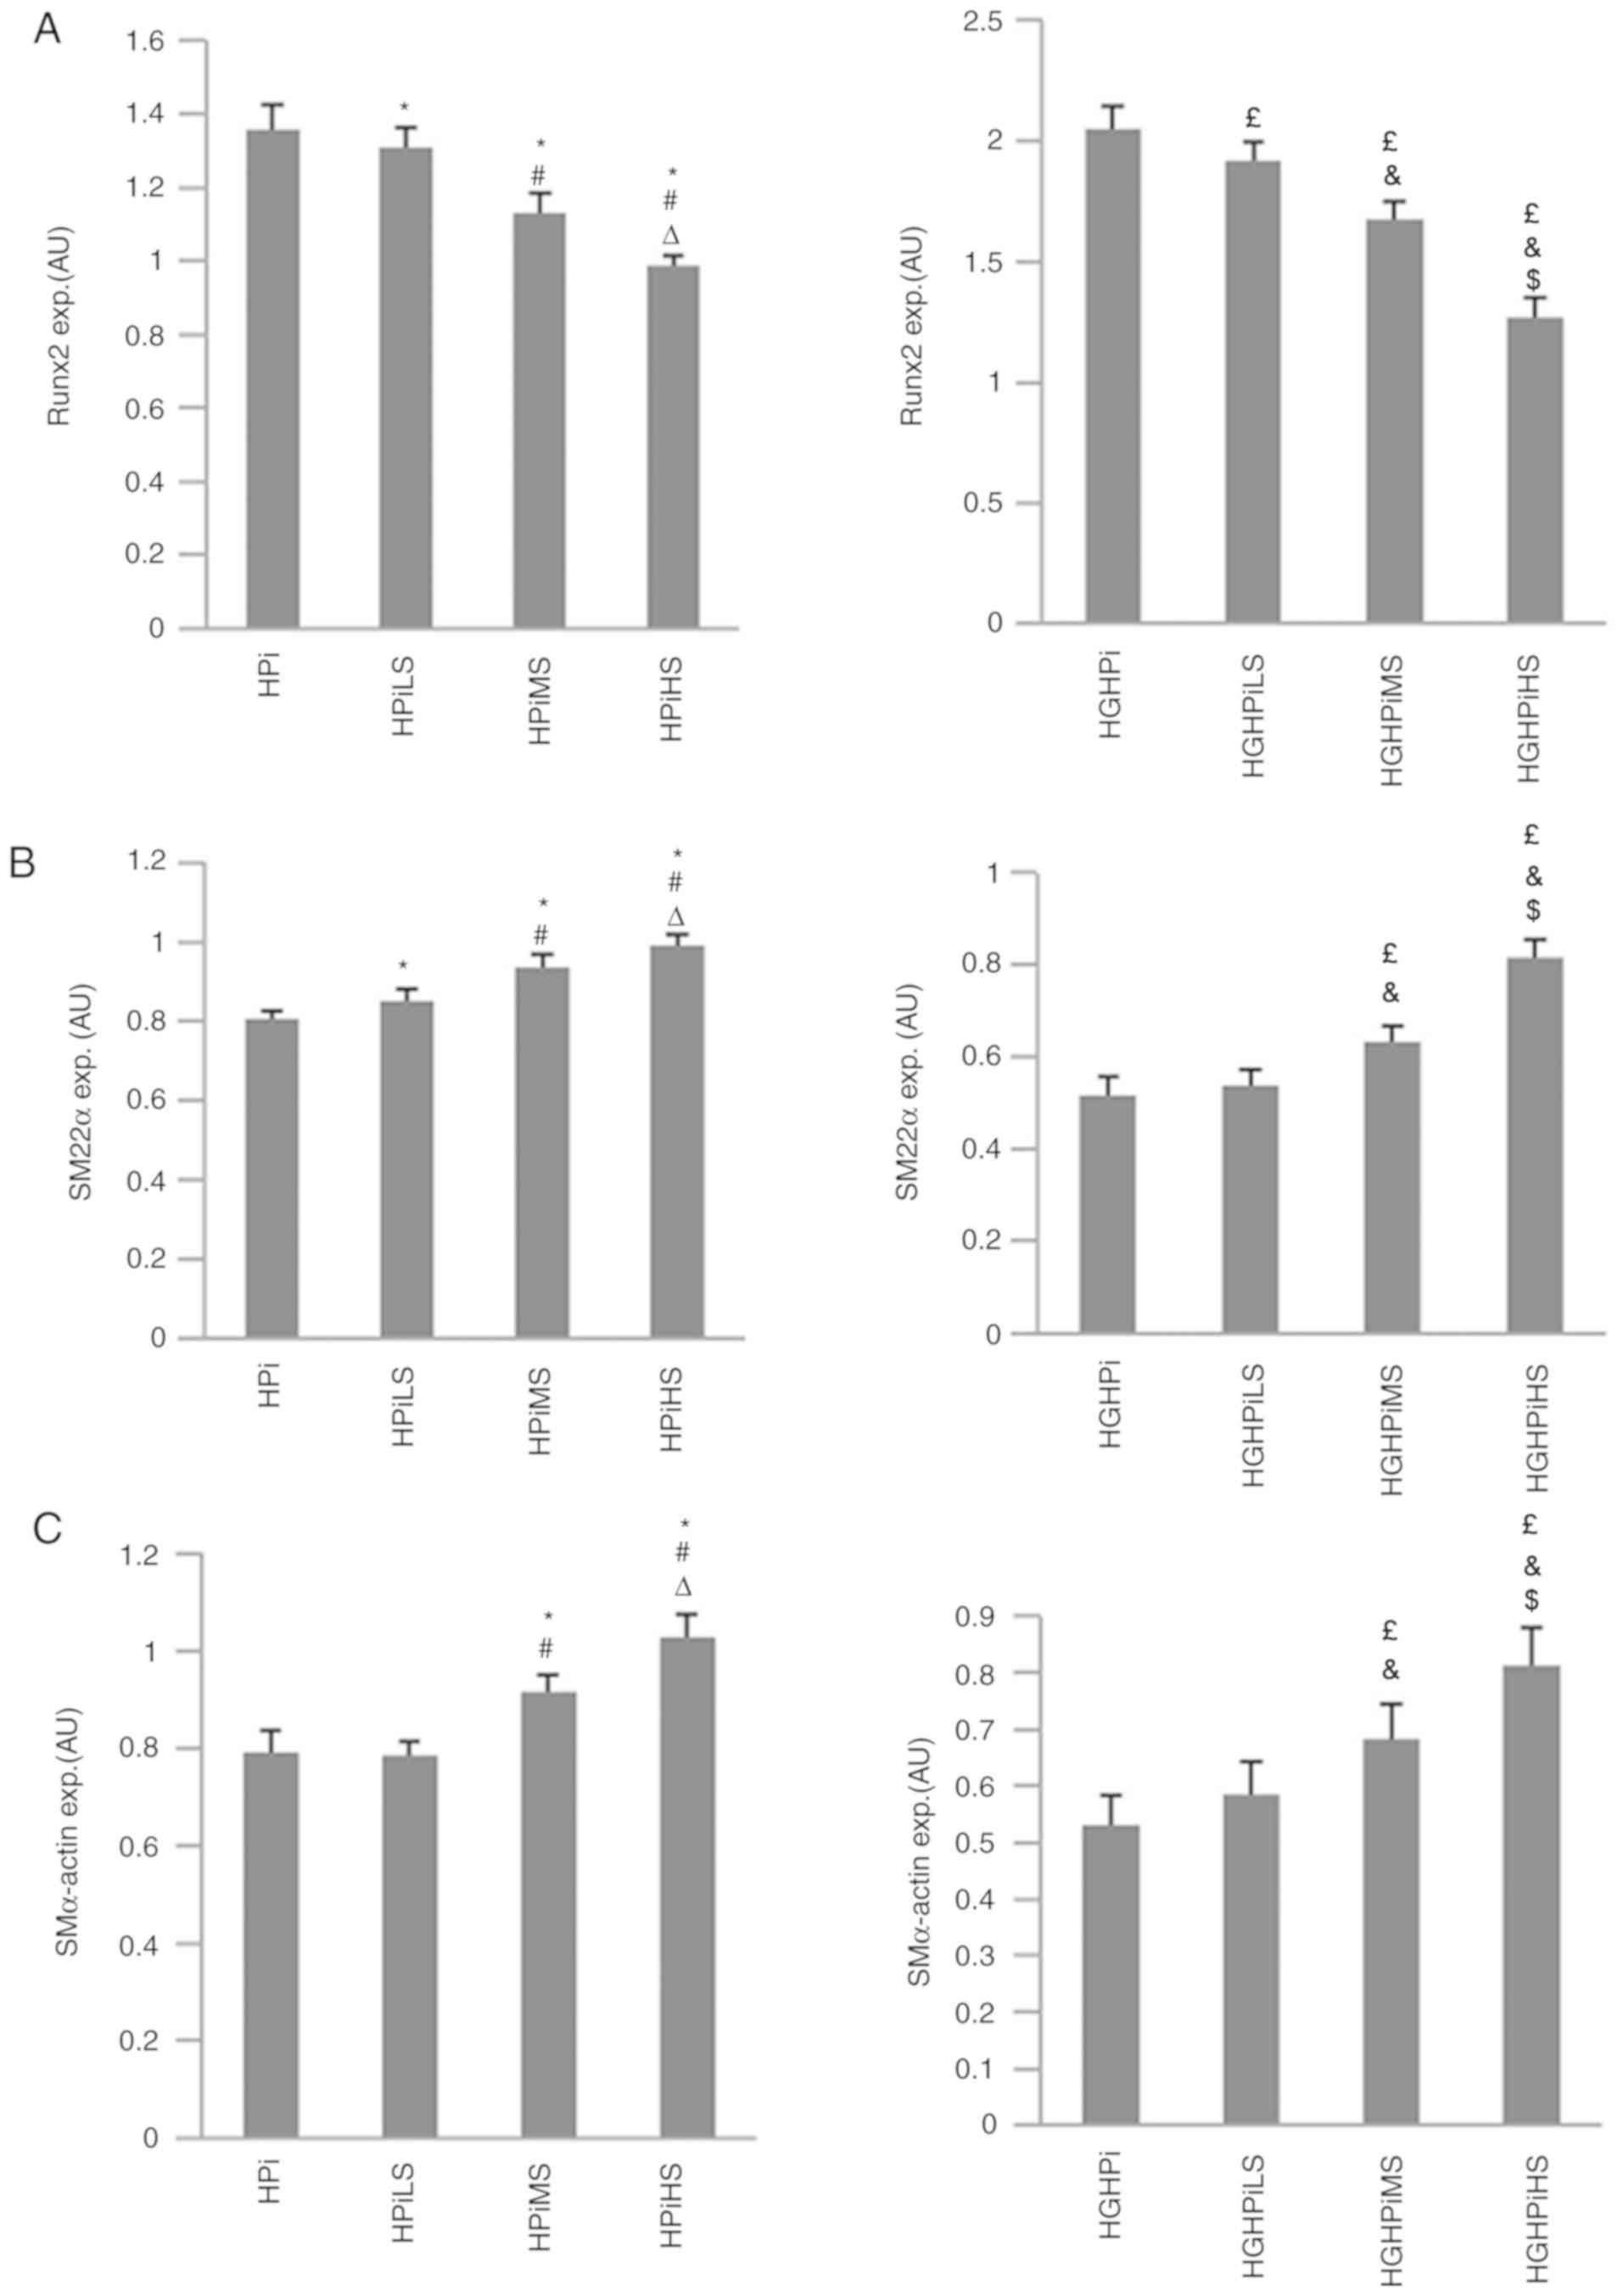 Spironolactone dose‑dependently alleviates the calcification